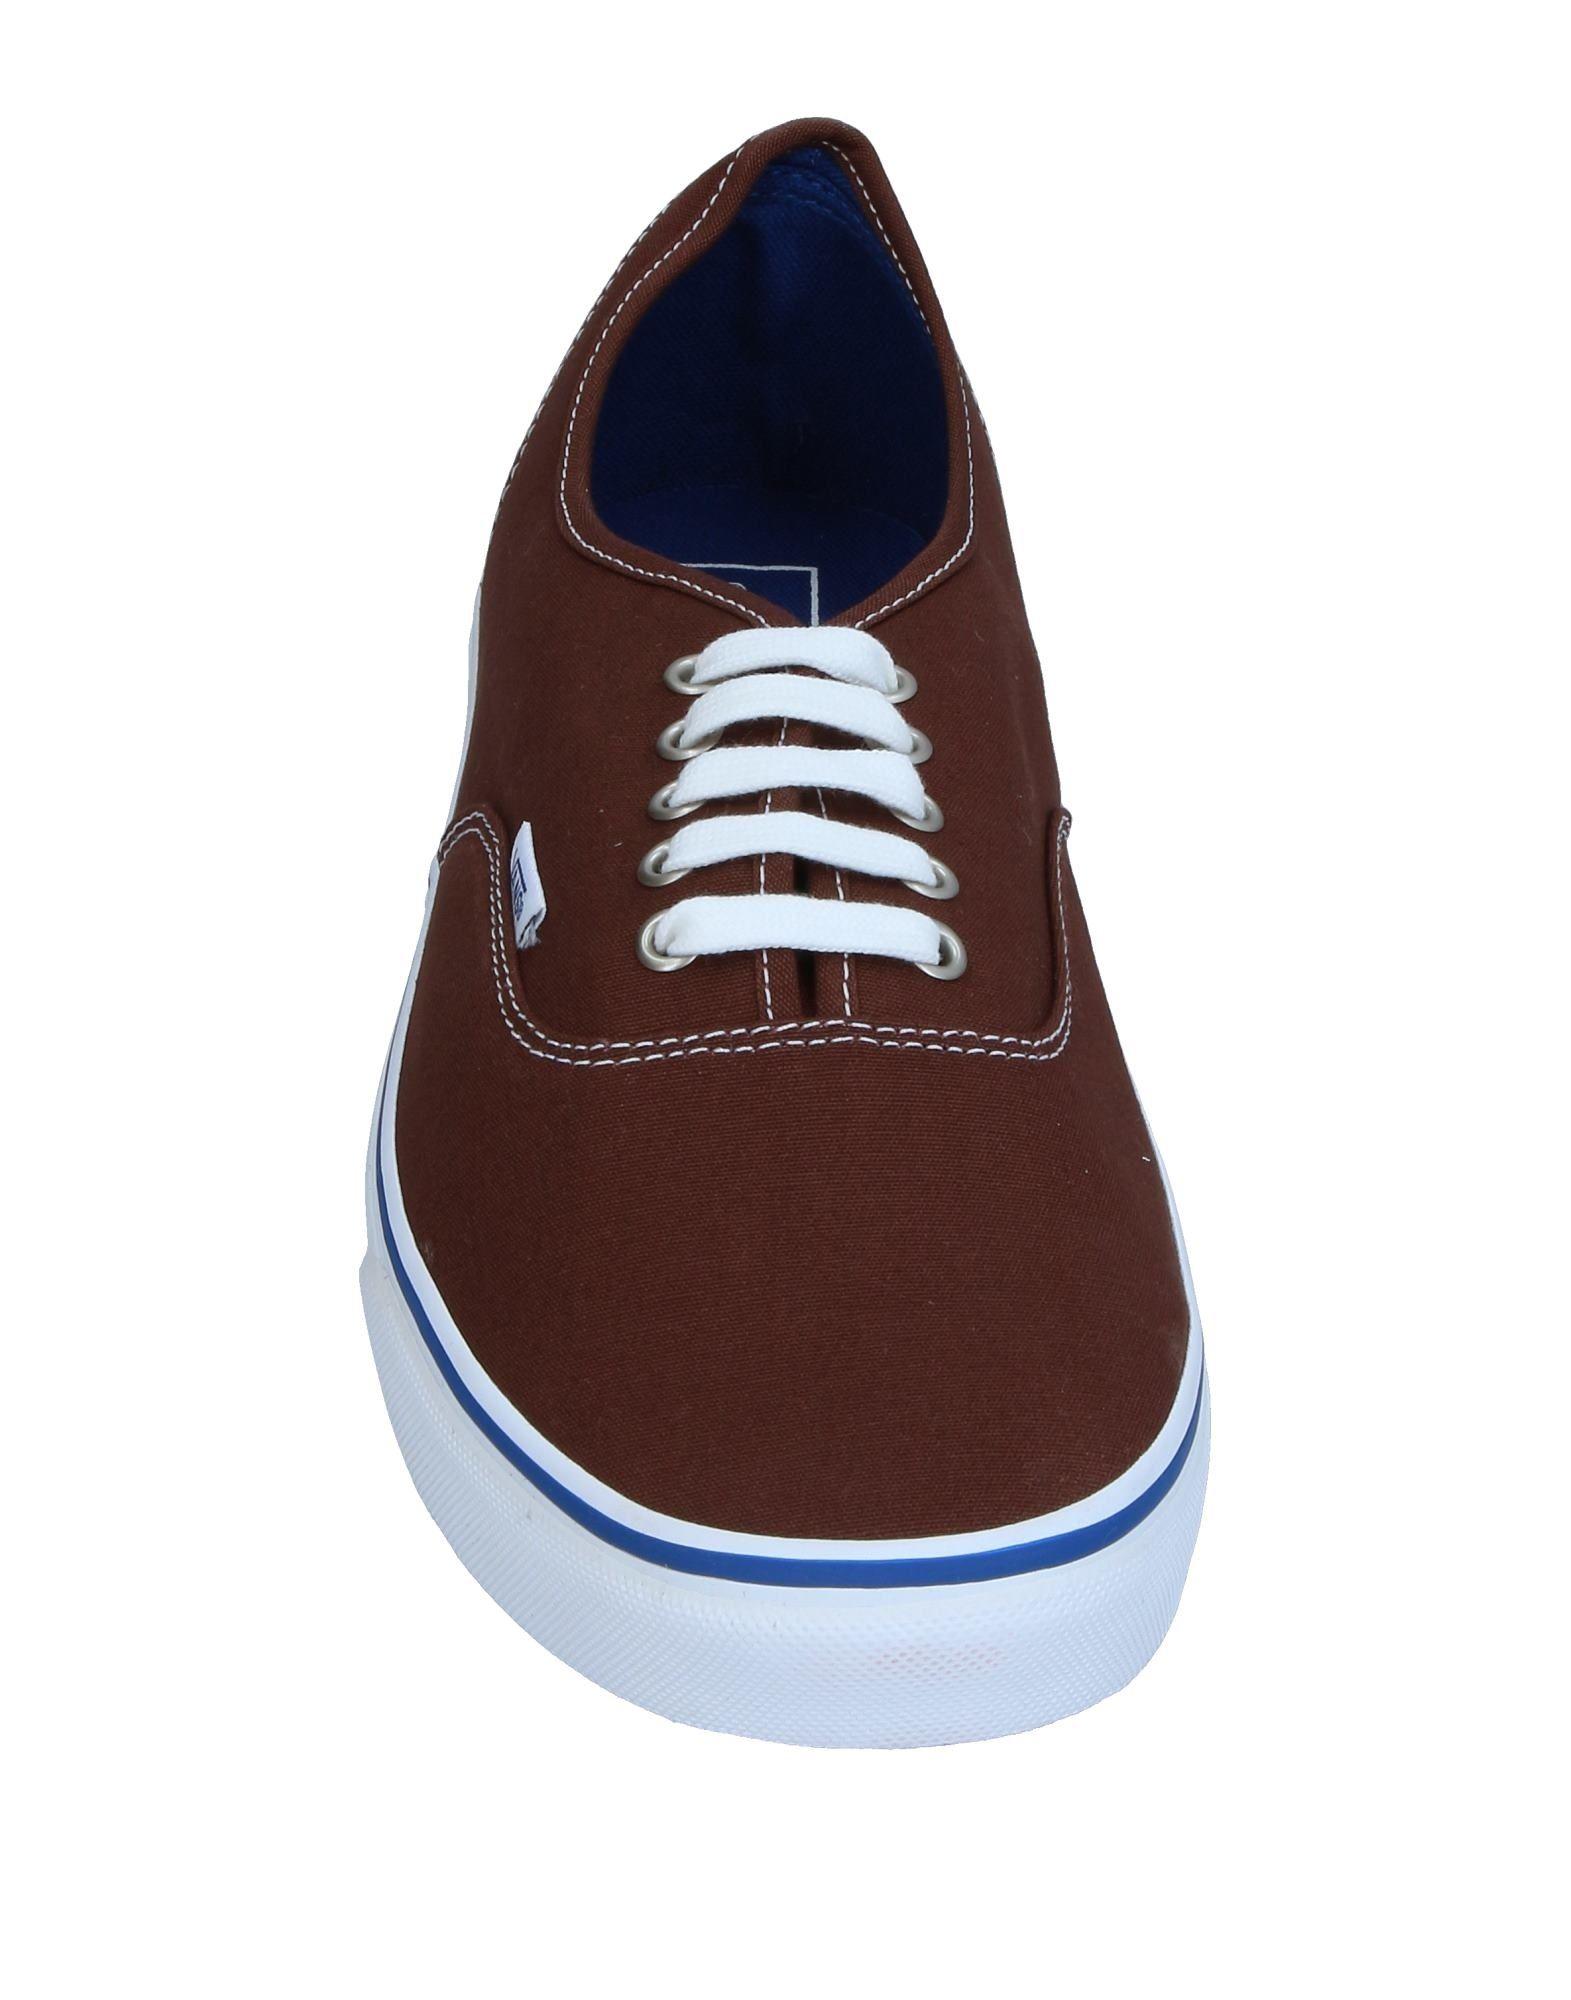 A buon mercato Sneakers Vans Uomo - 11376545VC